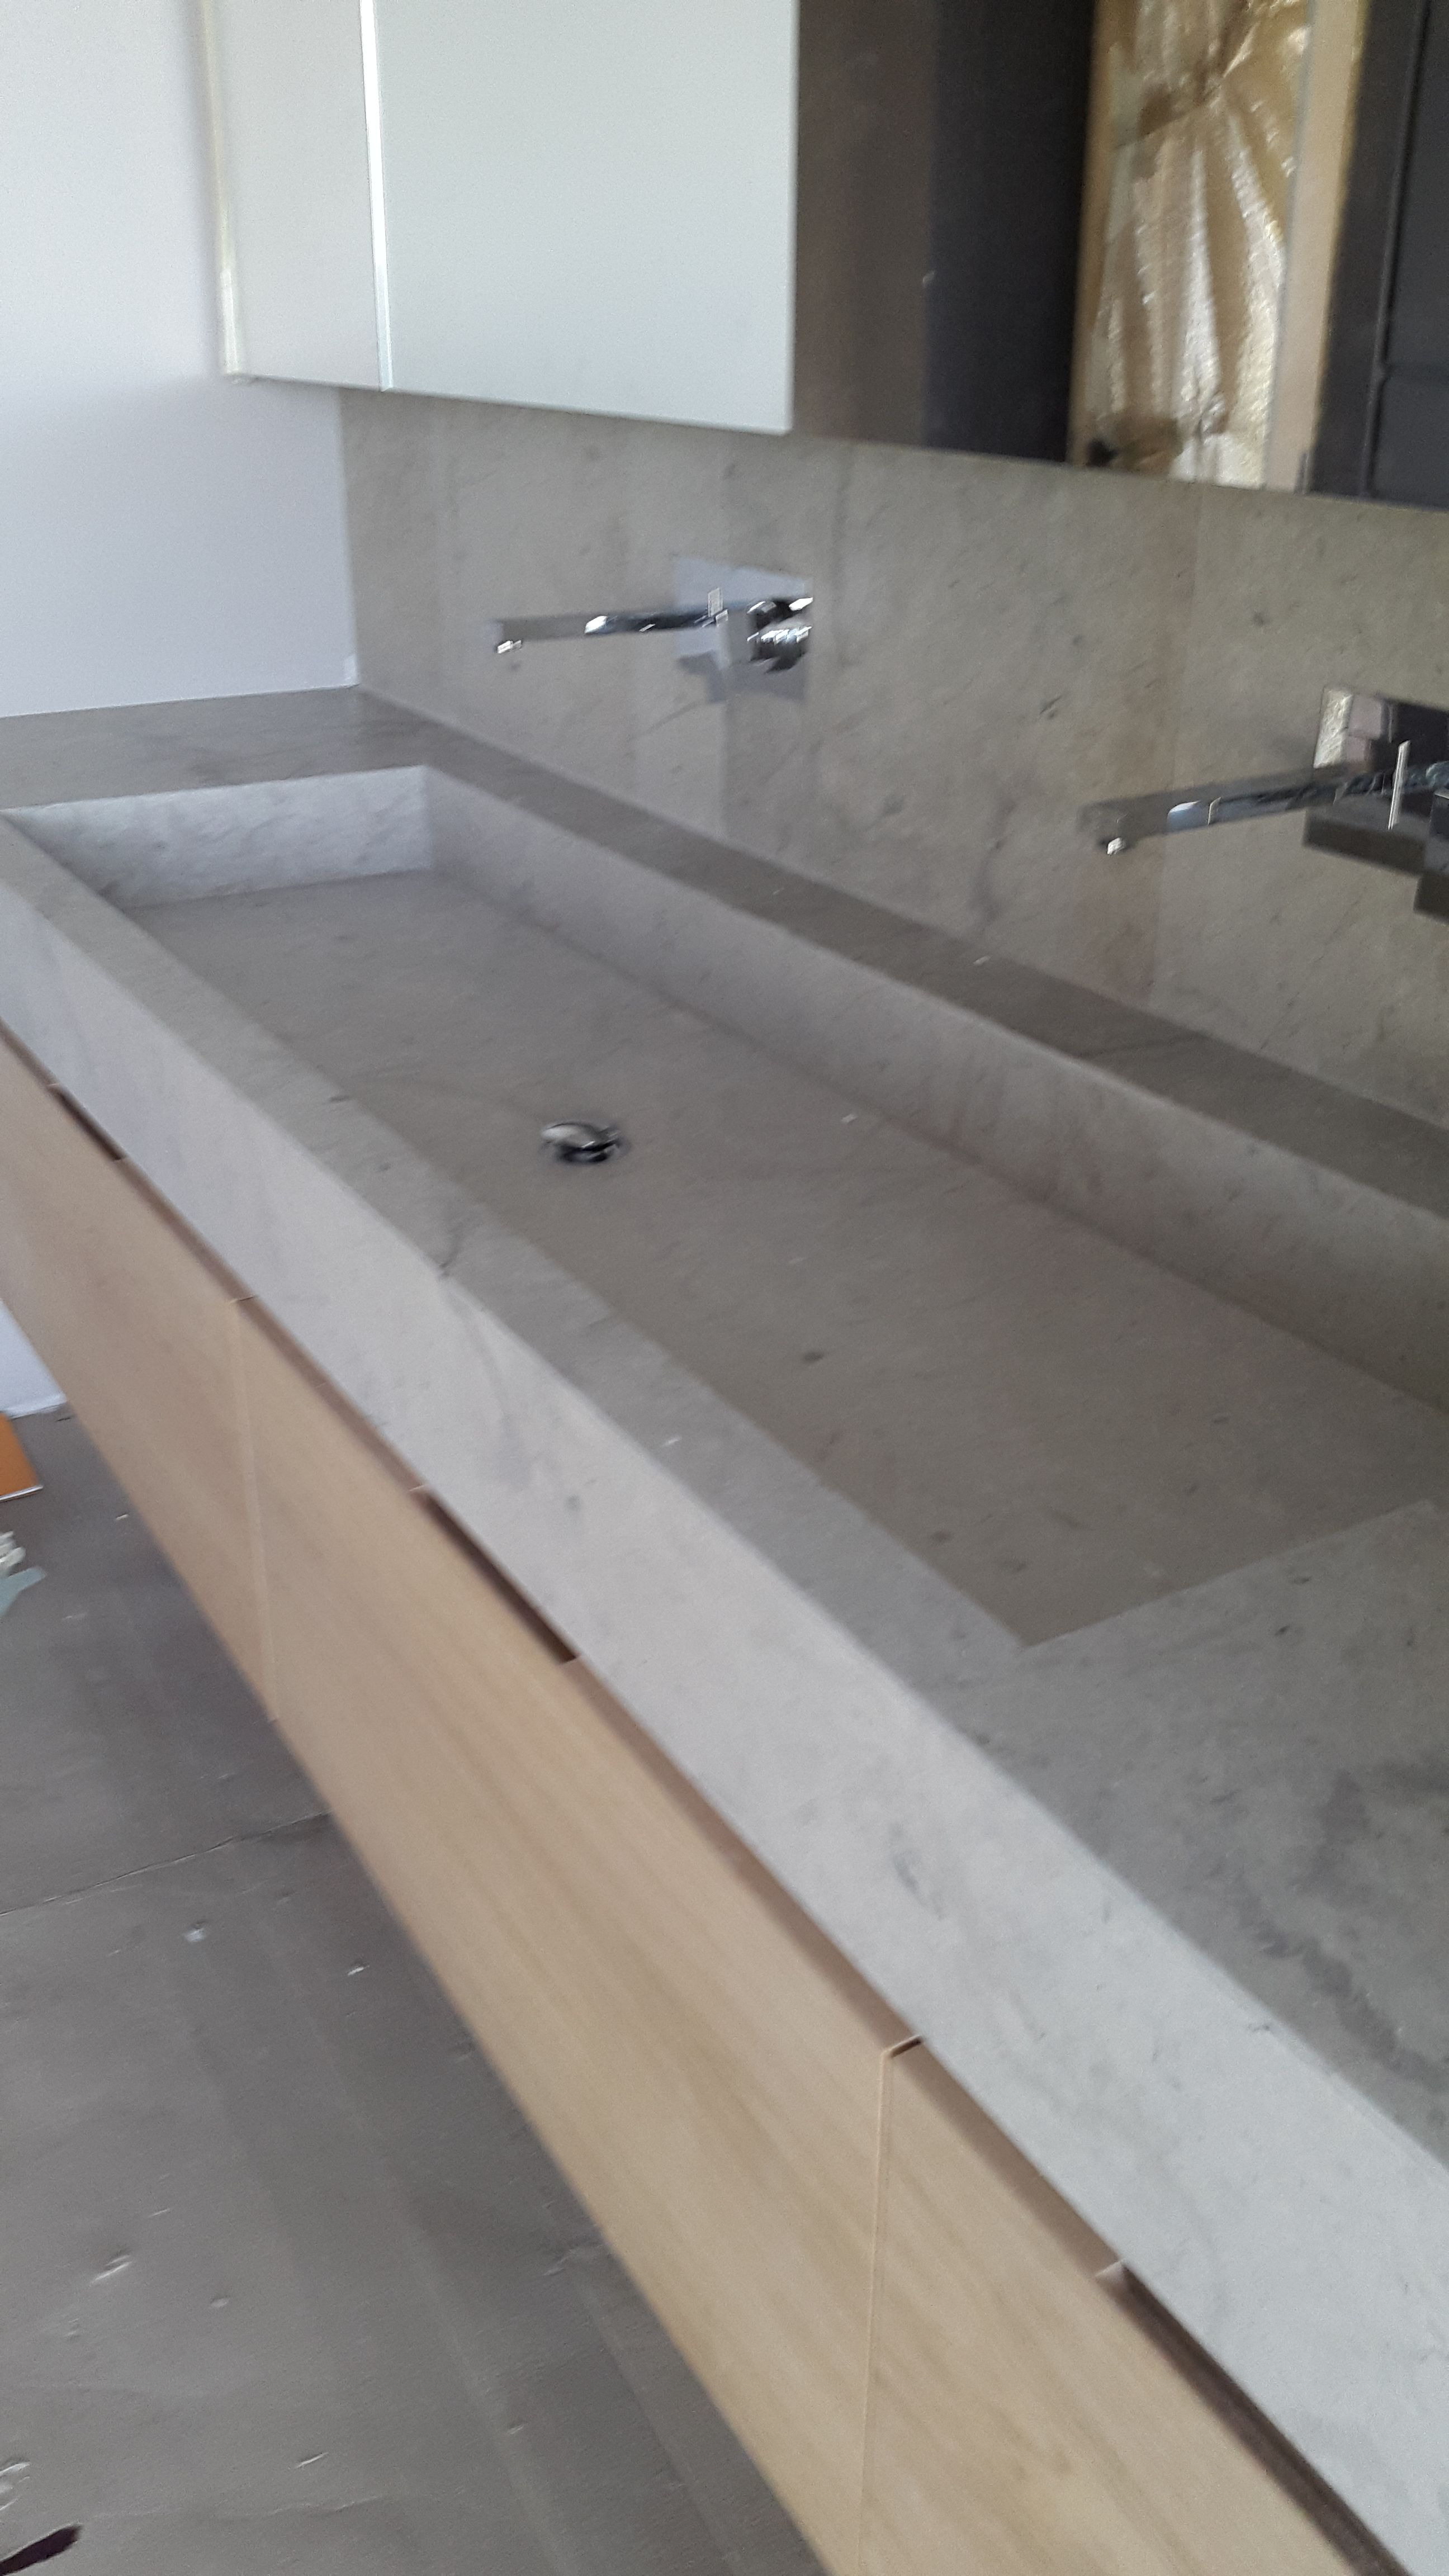 Plan Vasque En Pierre plan vasque en pierre effet massif | vasque pierre, plan